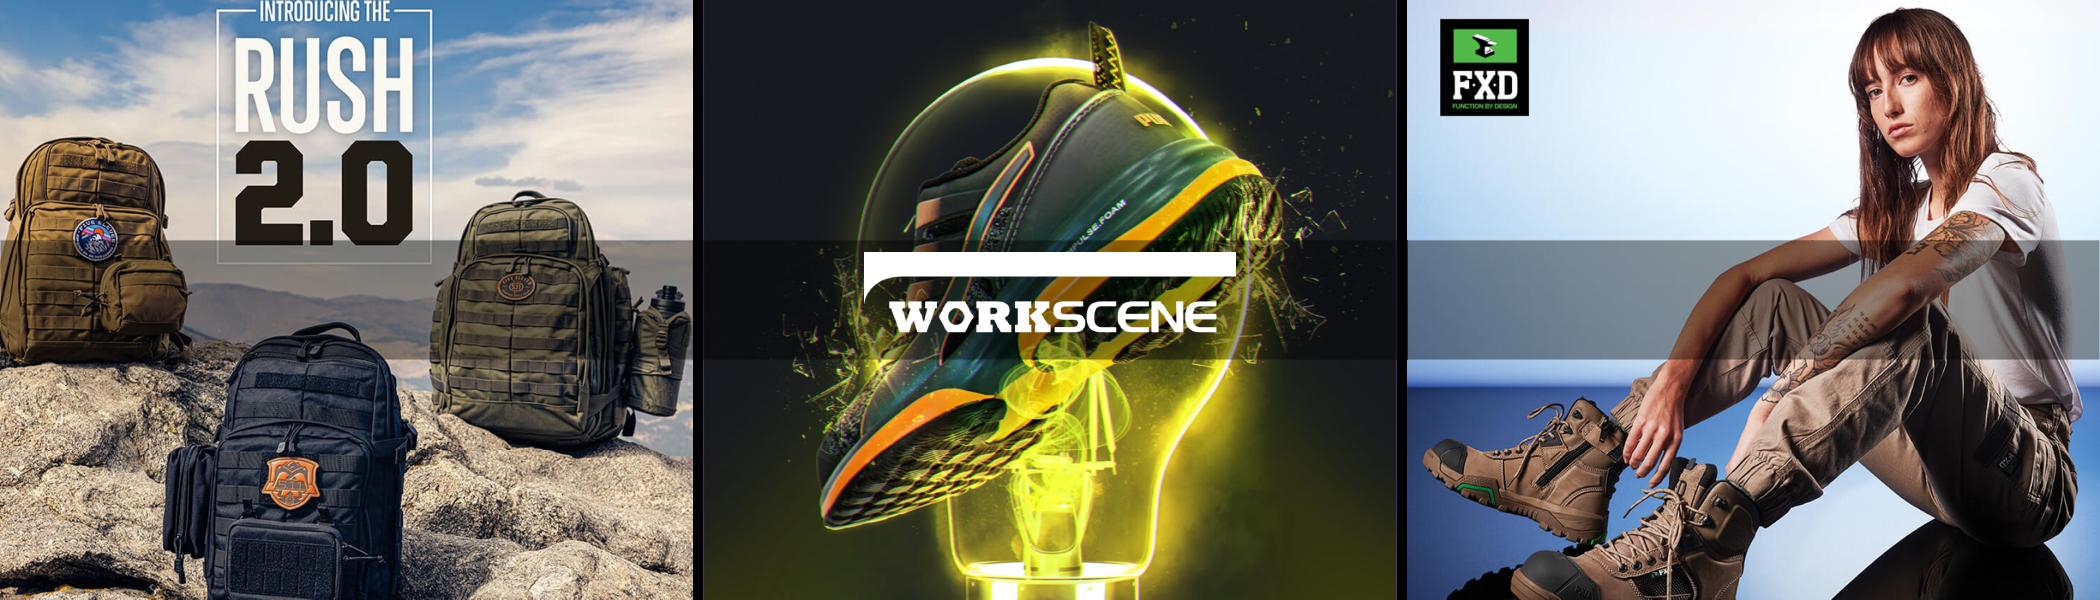 Workscene Shop